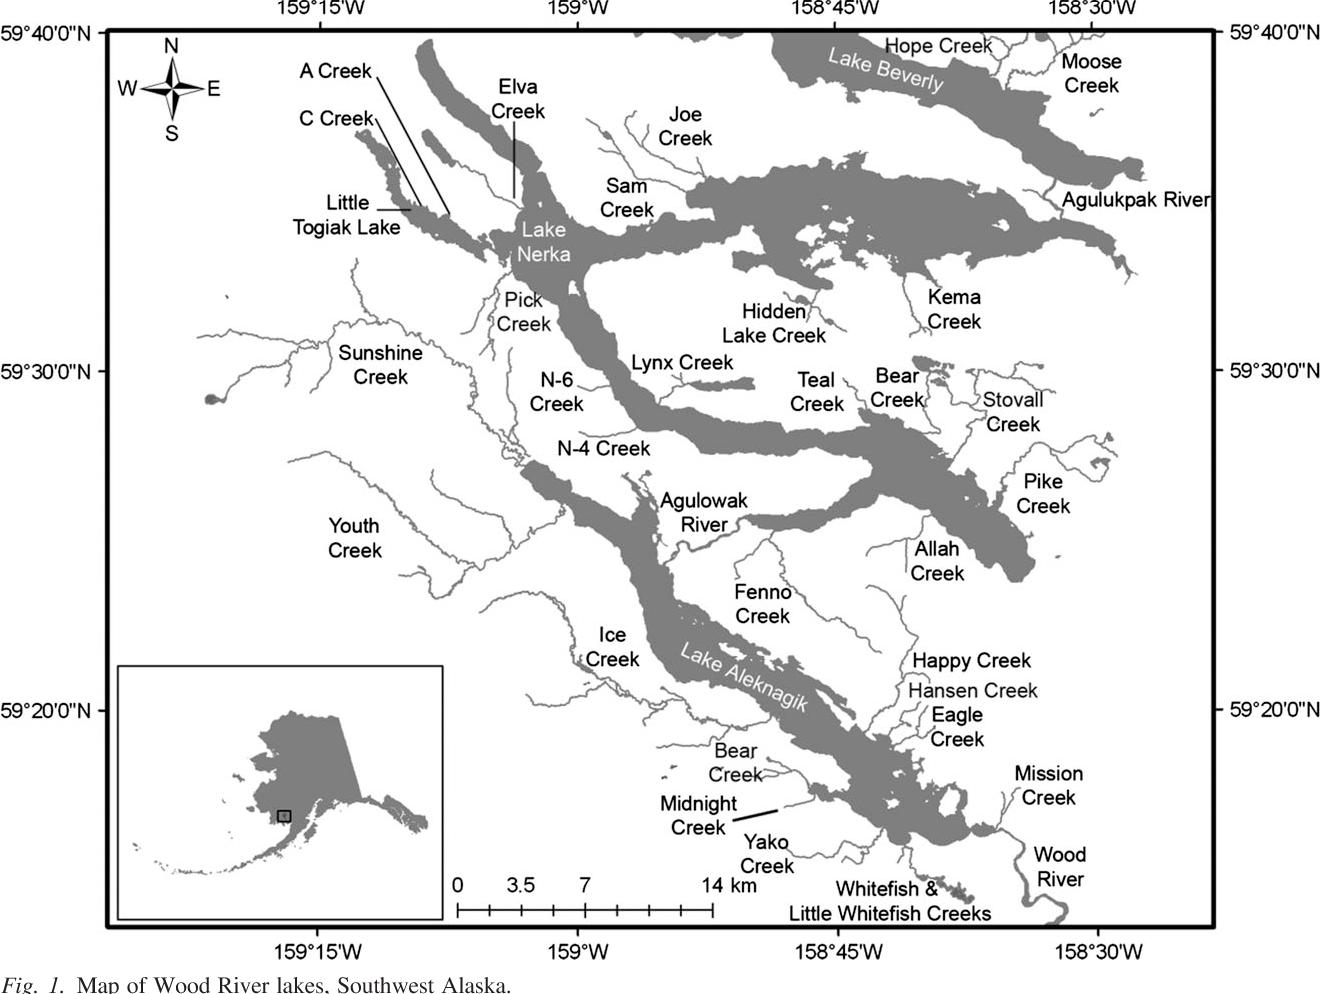 Figure 1 From Freshwater Habitat Associations Between Pink